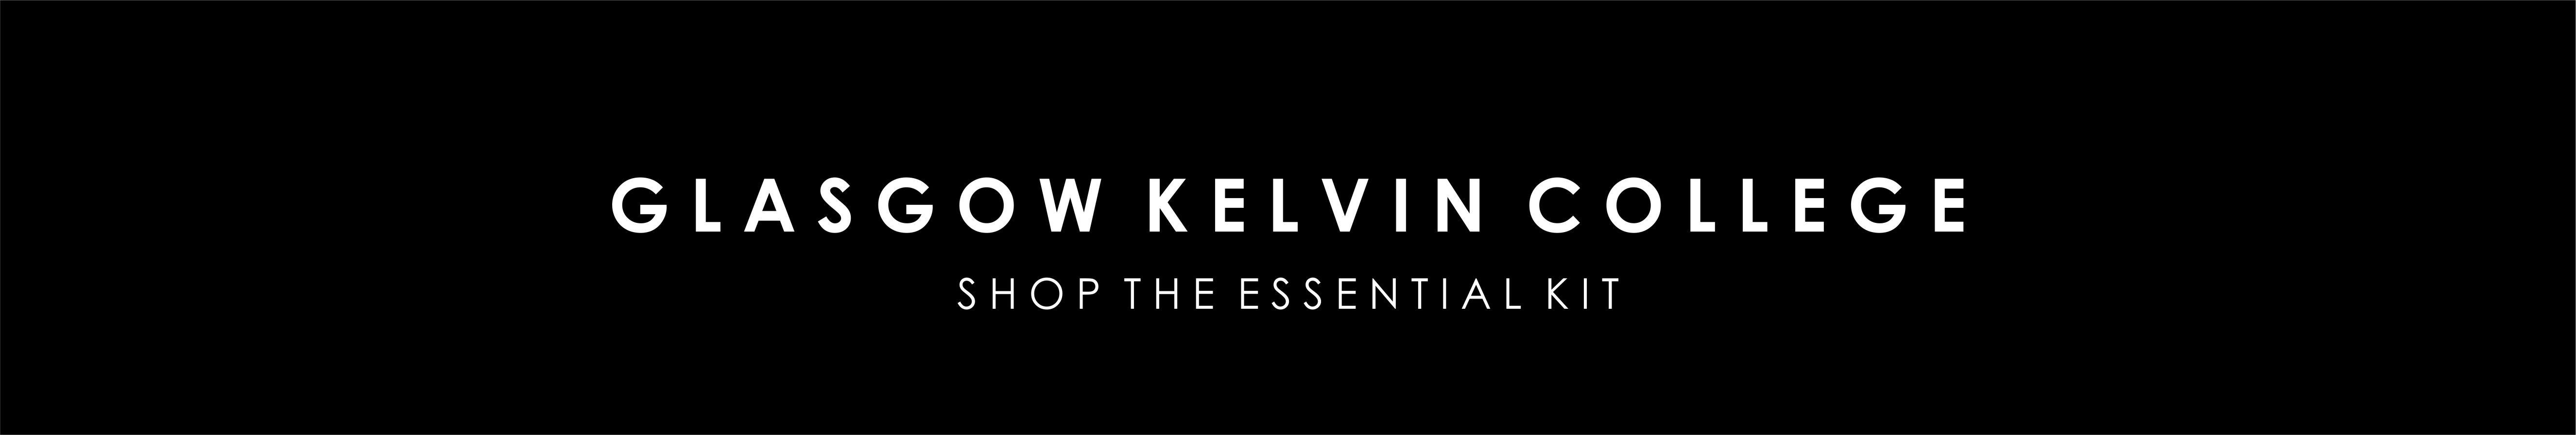 glasgow-kelvin-college-banner.jpg